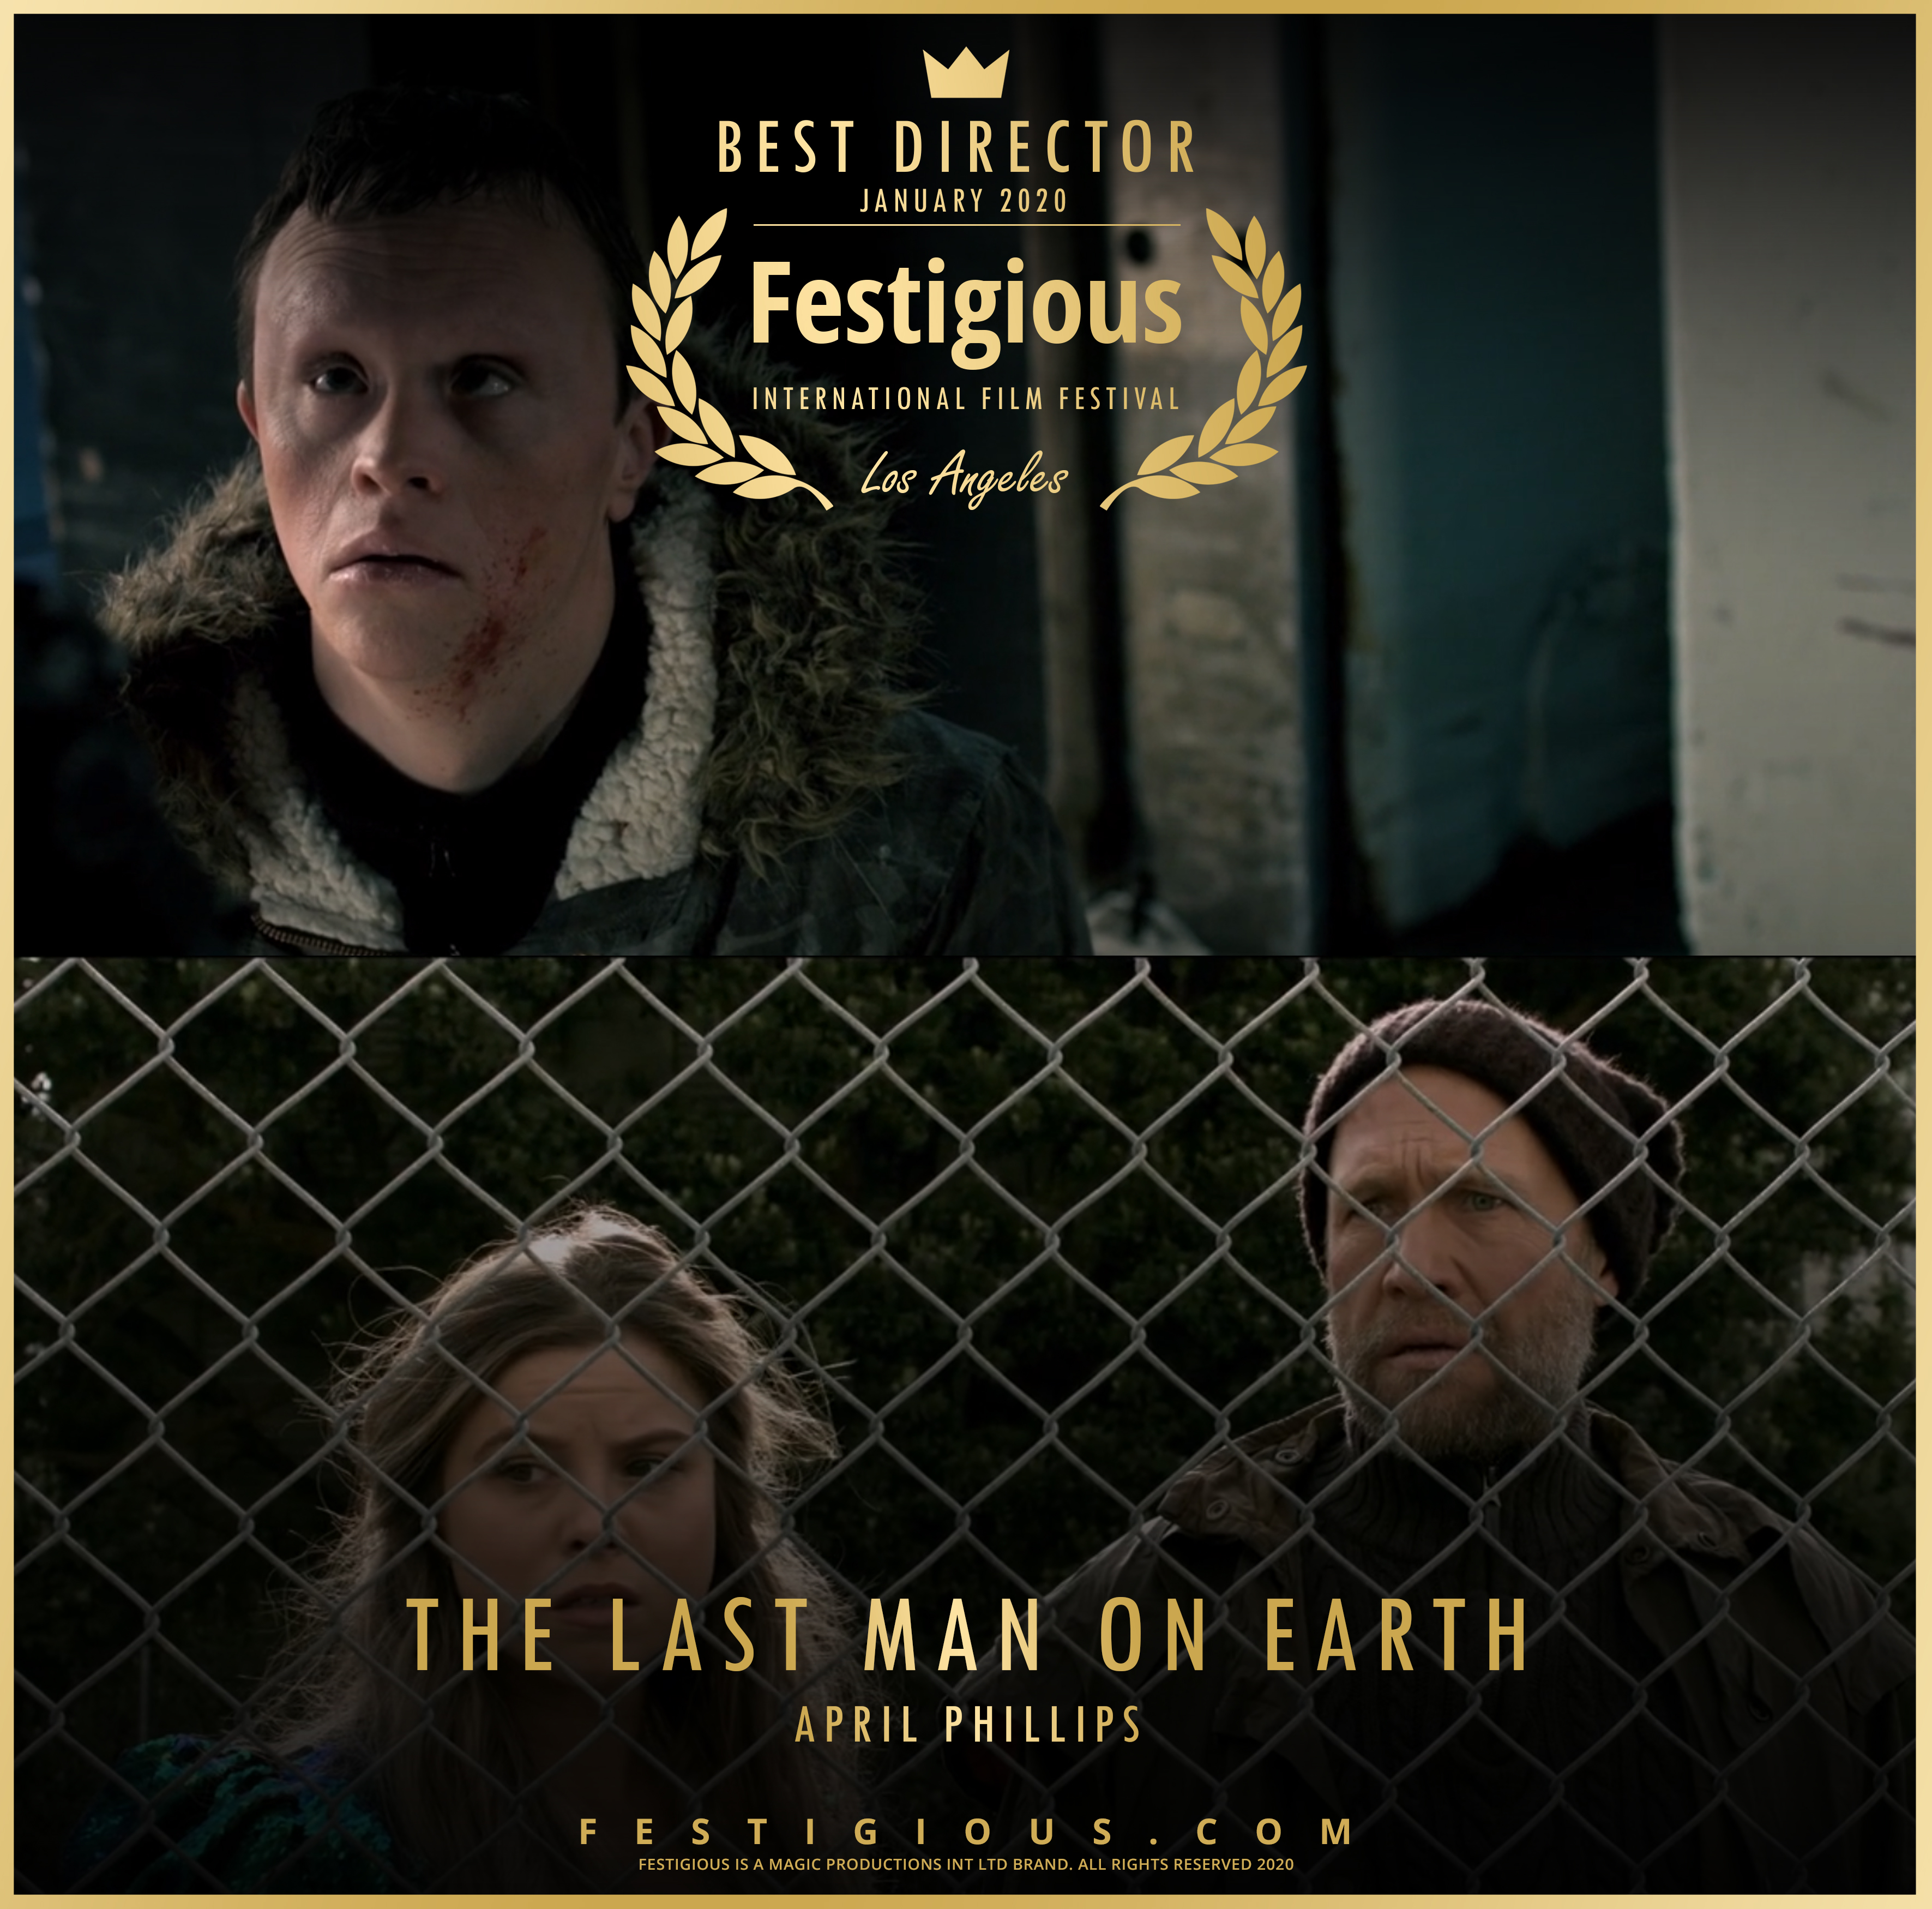 The Last Man on Earth design